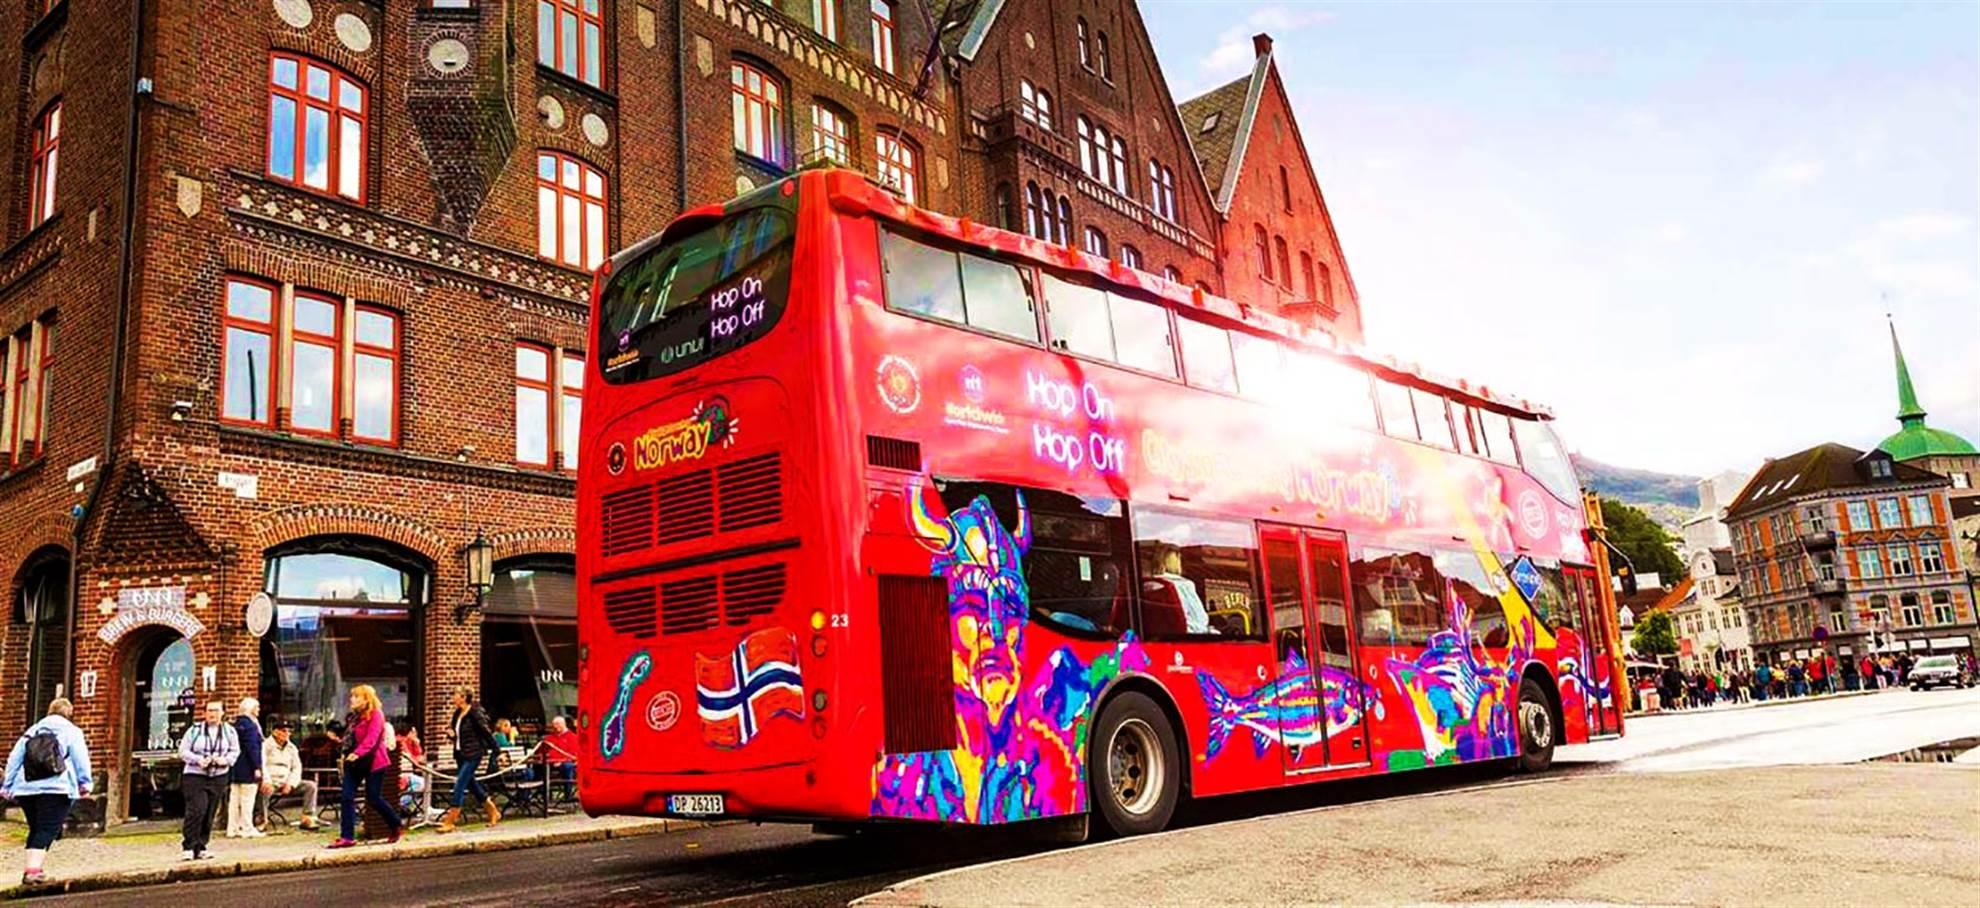 Bergen Hop on Hop off bus